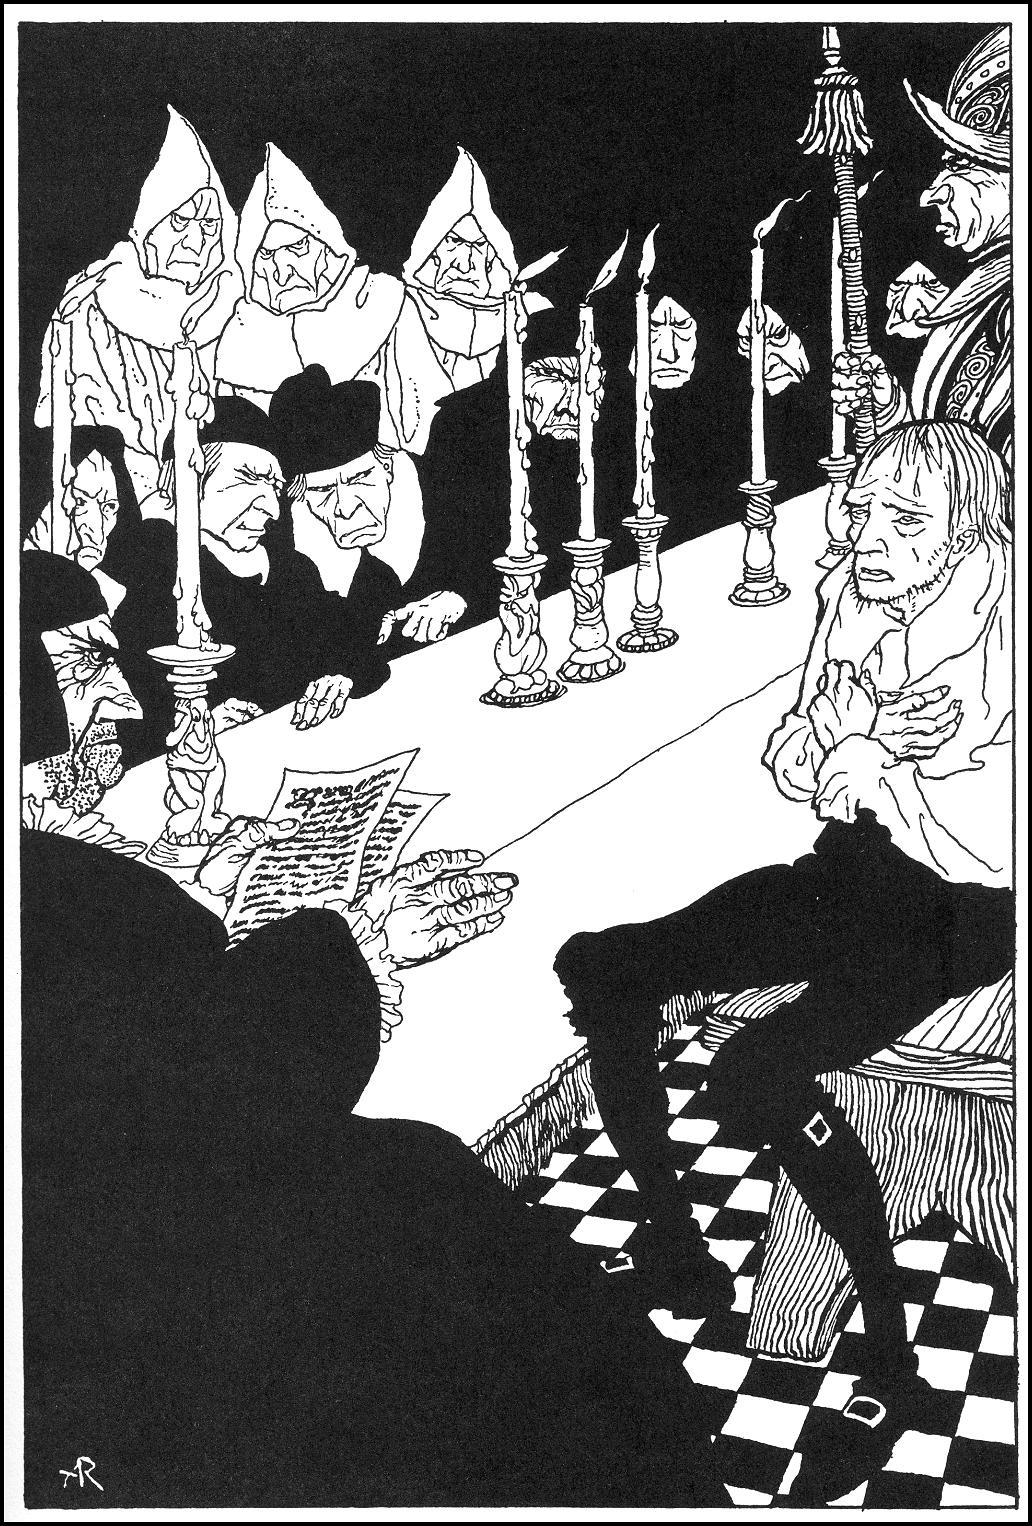 Essays On Antigone  Rackham Poe Pitpendulum Oedipus Tragic Hero Essay also Of Mice And Men Essay Topics The Pit And The Pendulum  Literawiki  Fandom Powered By Wikia Essay Writing Topics For School Students